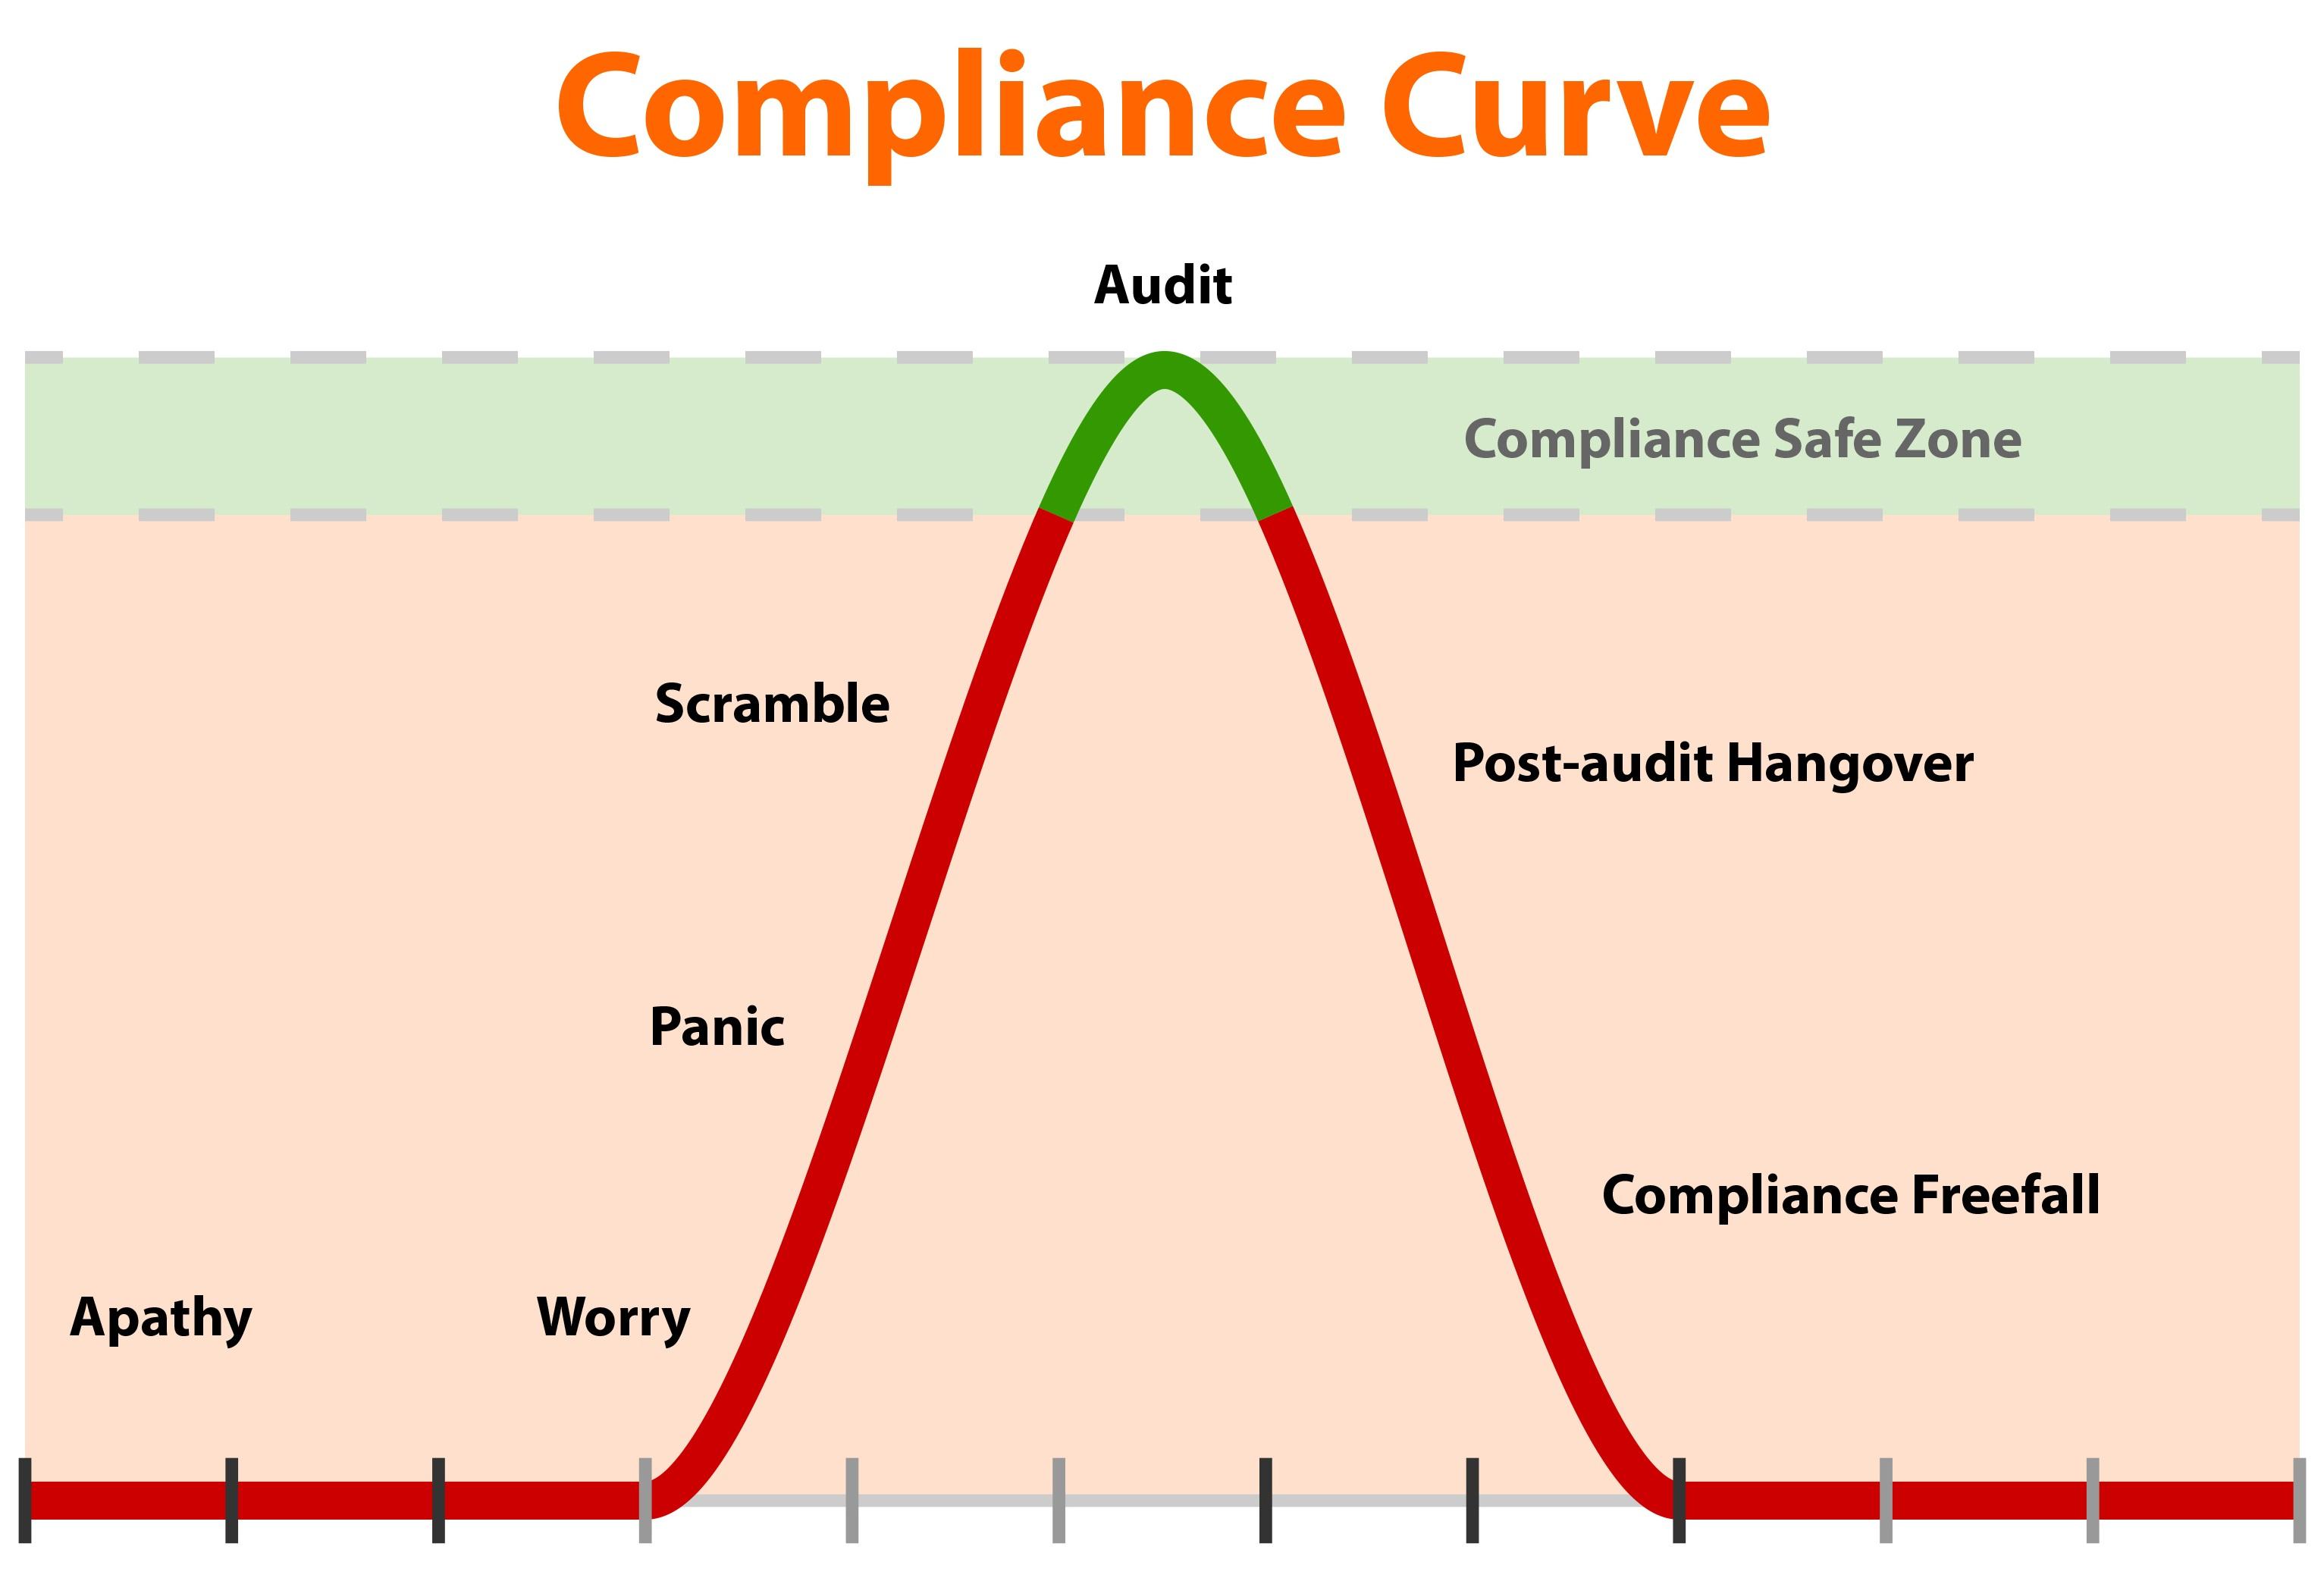 The Compliance Curve